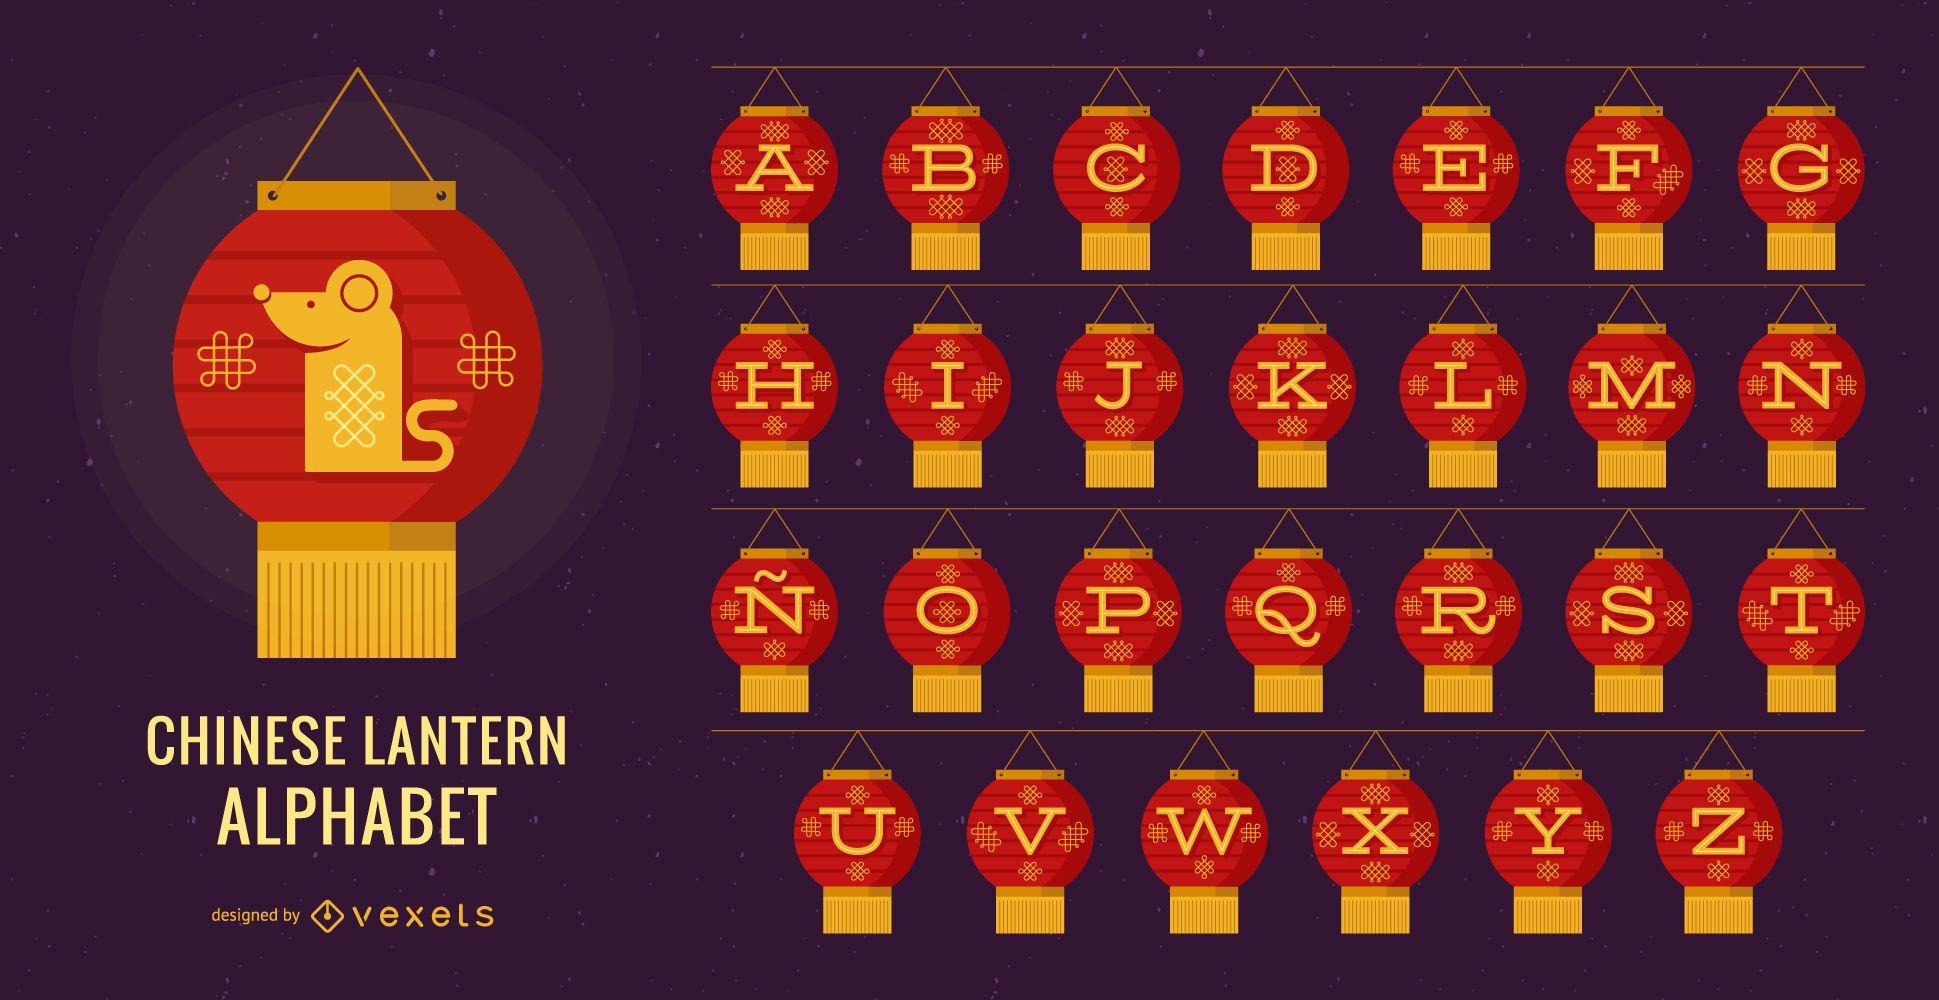 Chinese Lantern Alphabet Letter Set